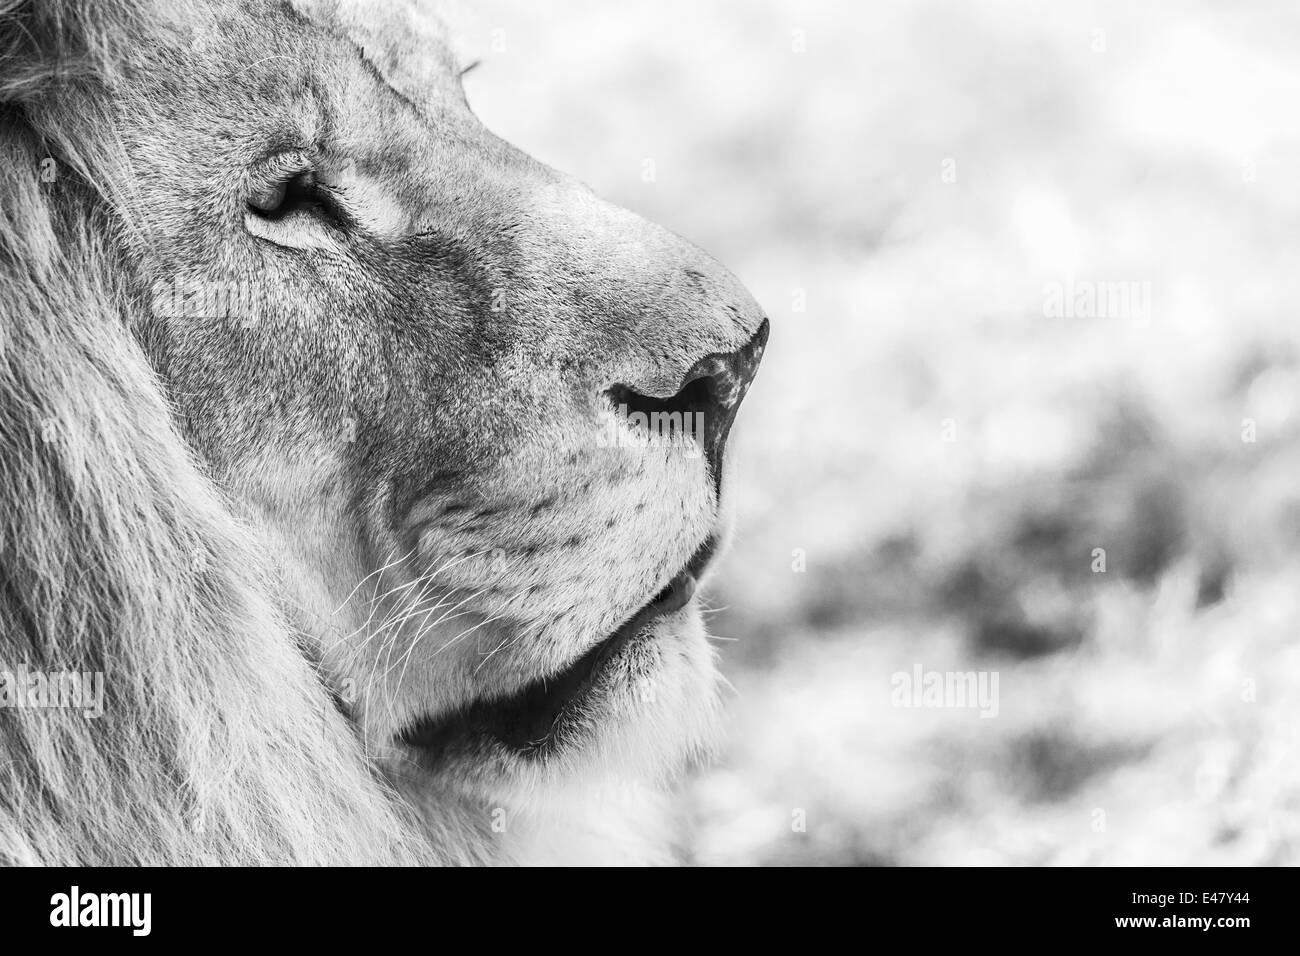 Black And White Lion Portrait Stock Photo